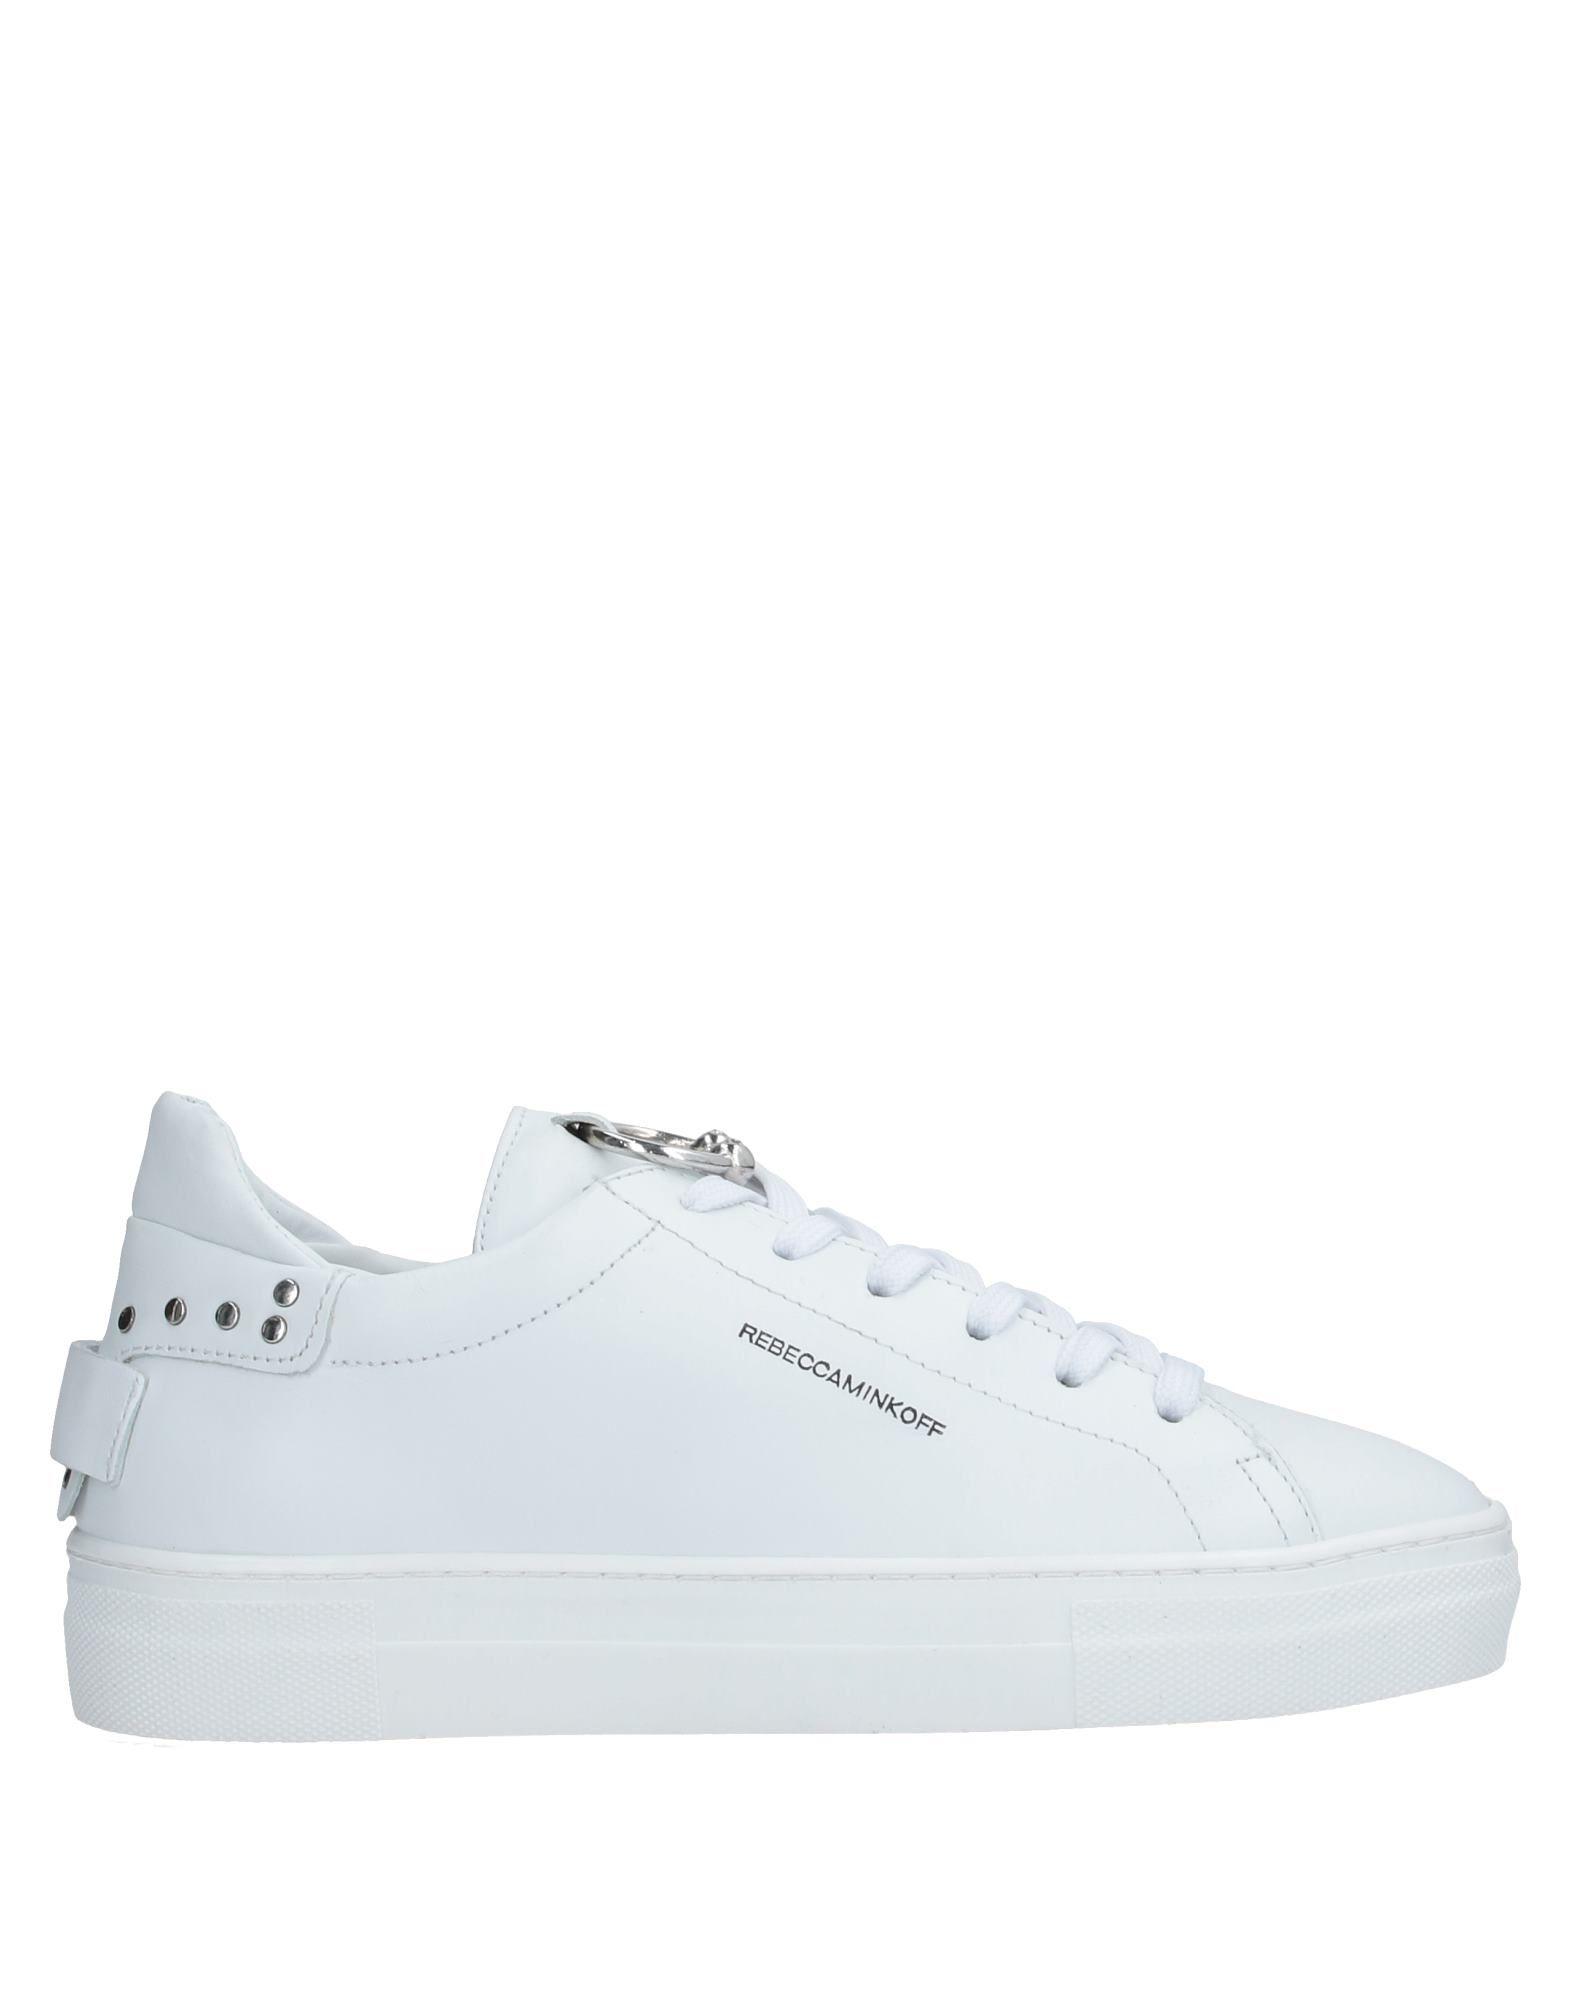 REBECCA MINKOFF Низкие кеды и кроссовки rebecca white высокие кеды и кроссовки